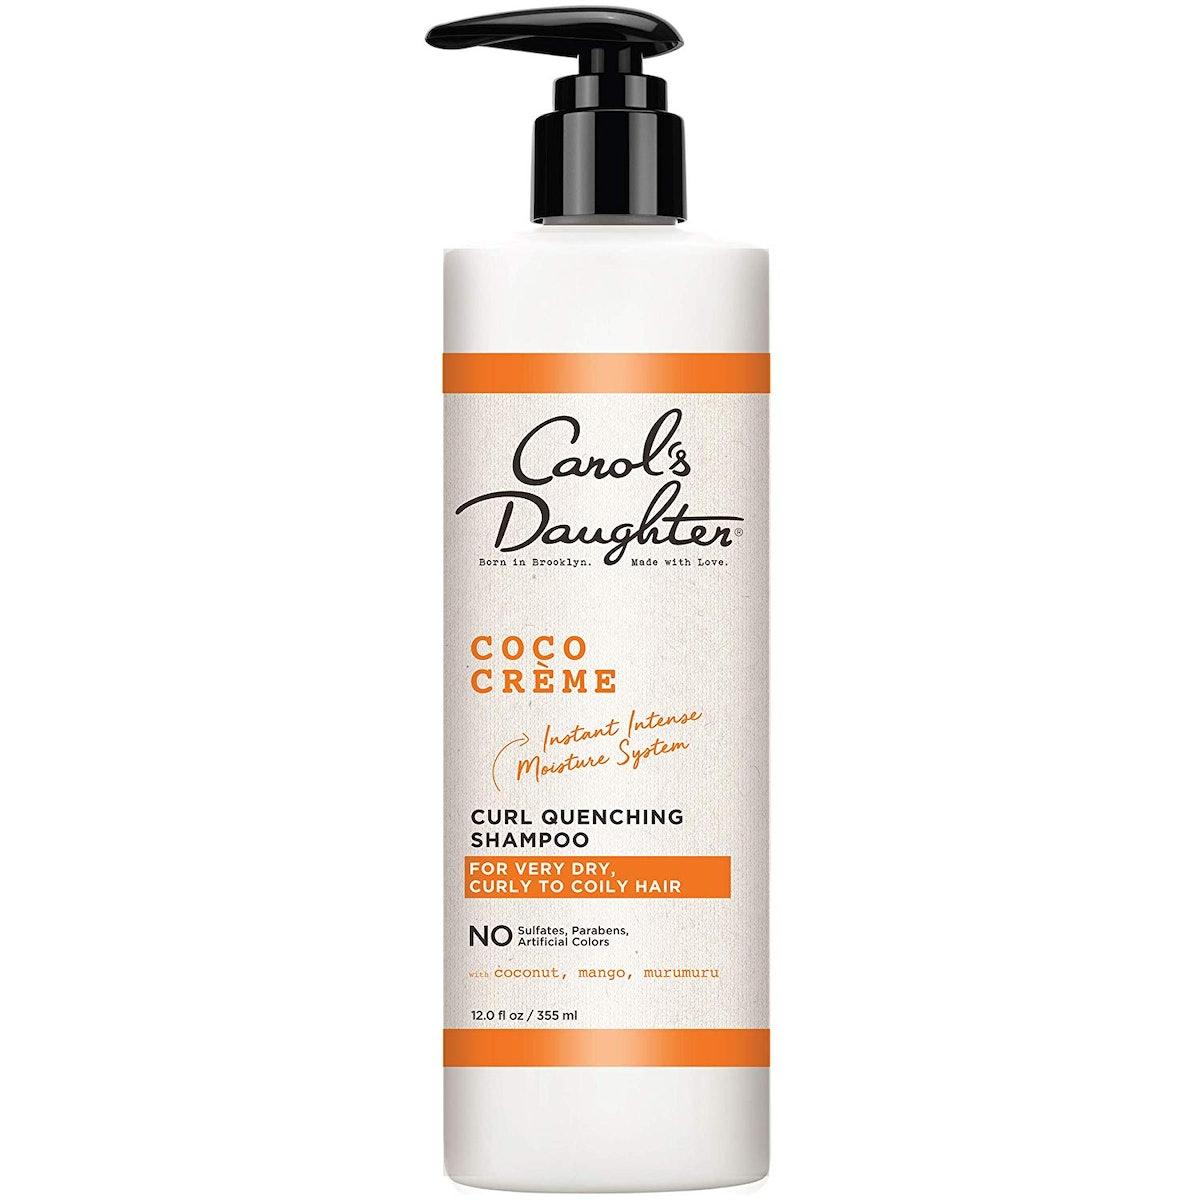 Carol's Daughter Coco Crème Curl Quenching Shampoo